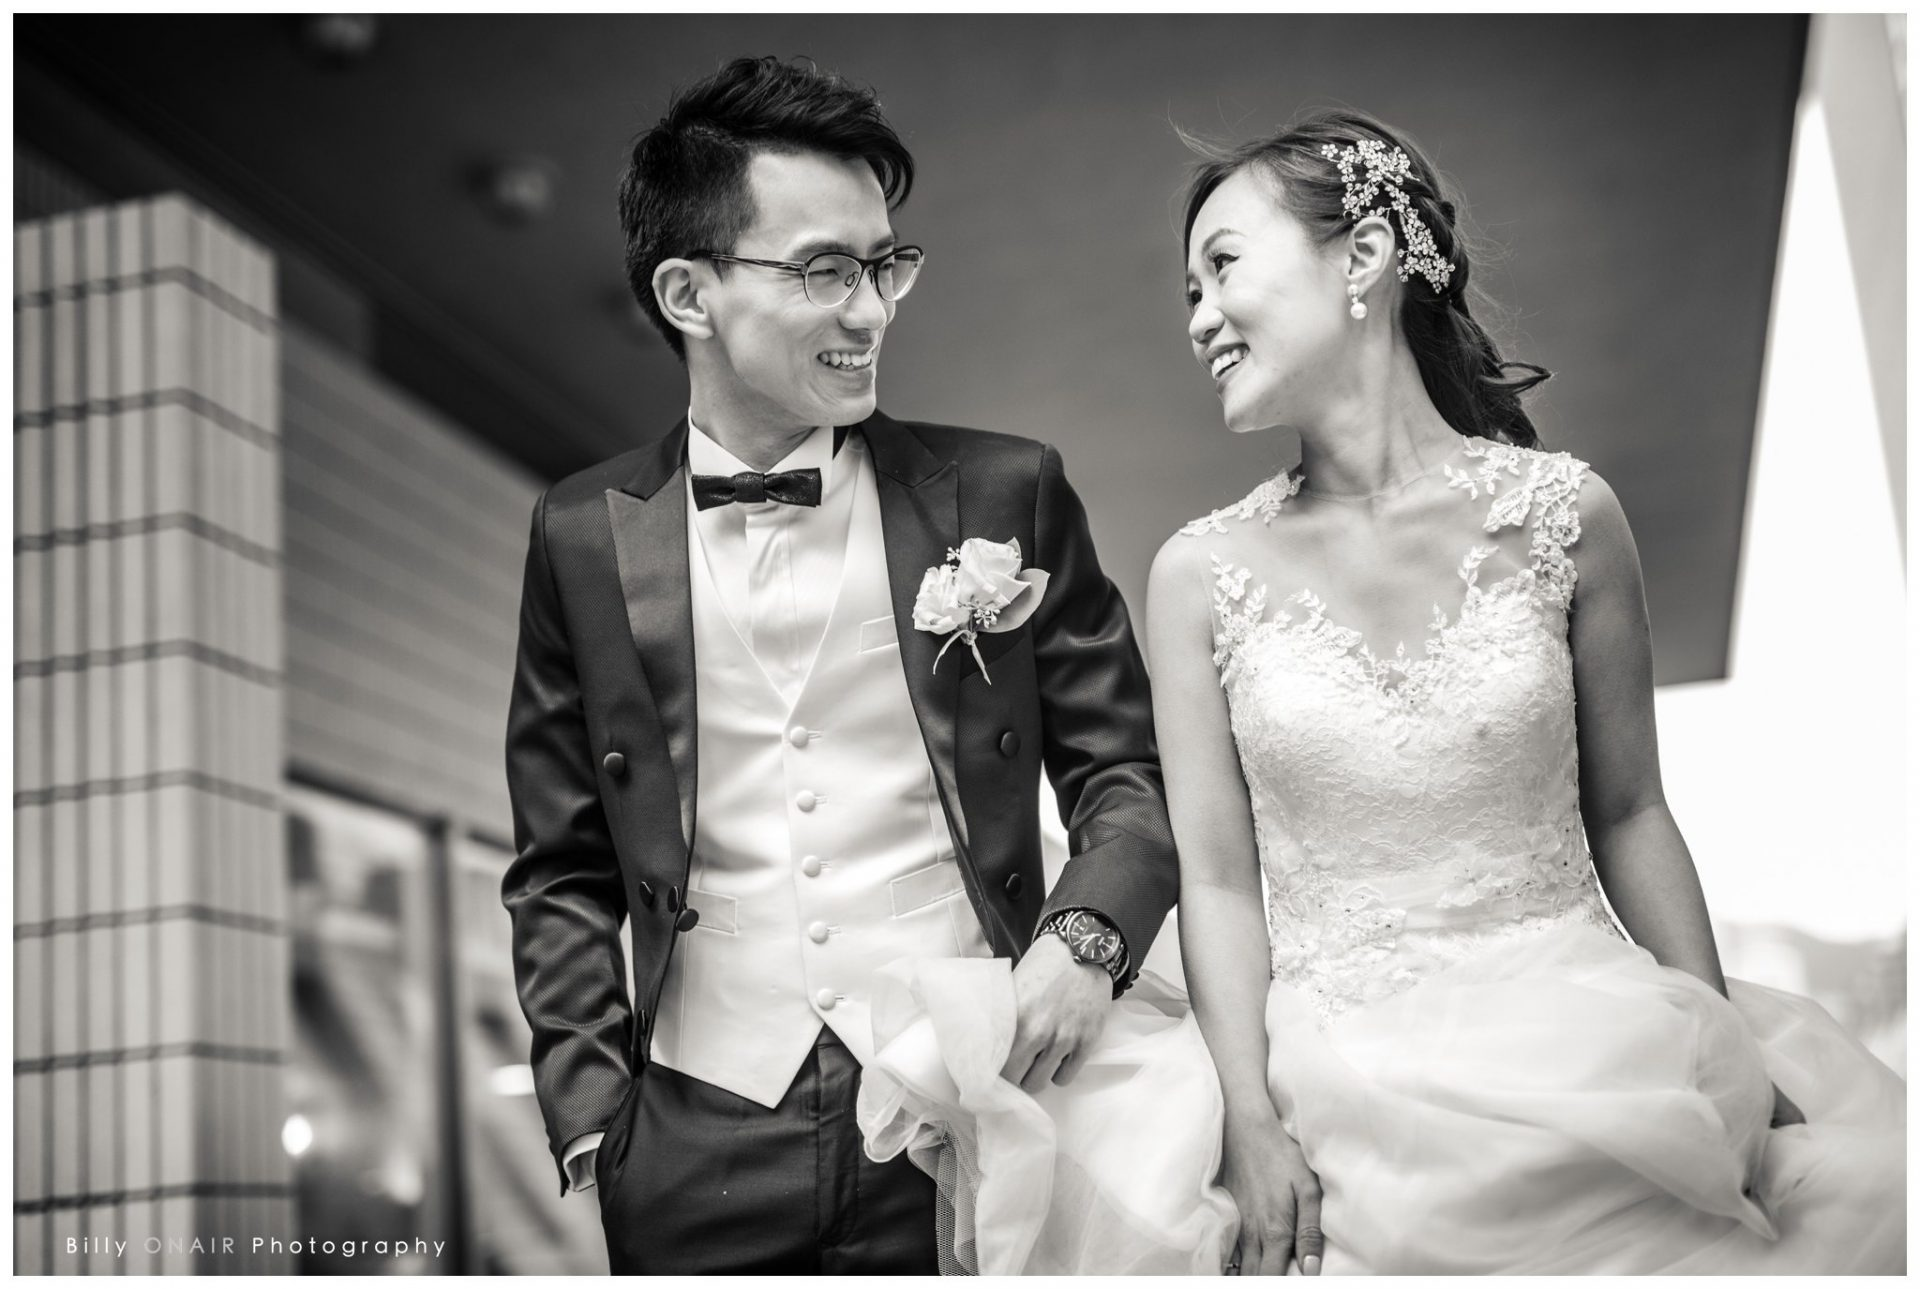 billy_wedding_photography_024